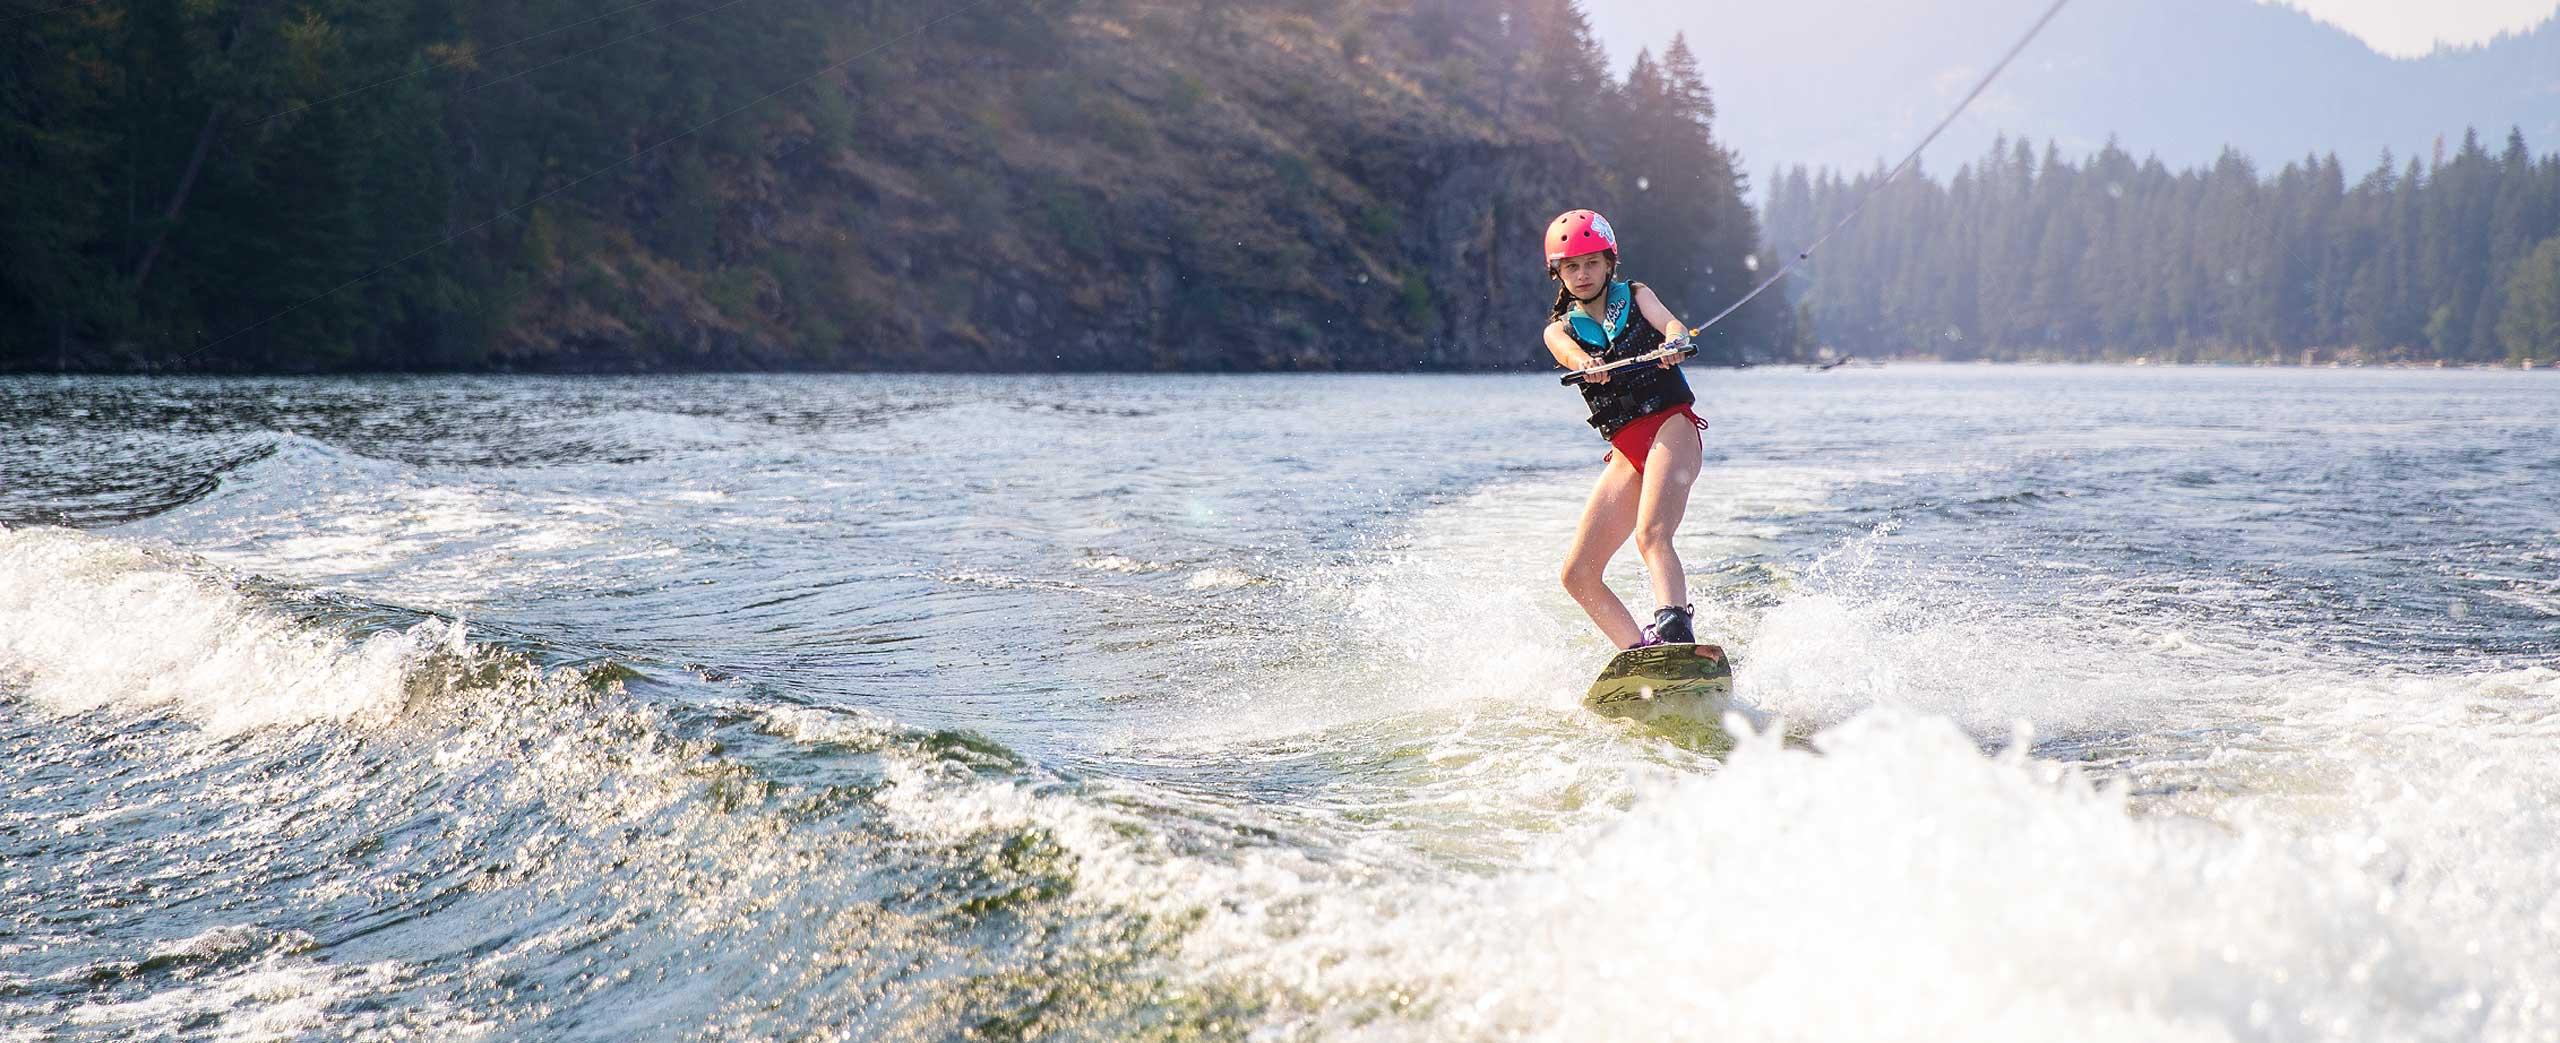 Middle school camper wakeboarding